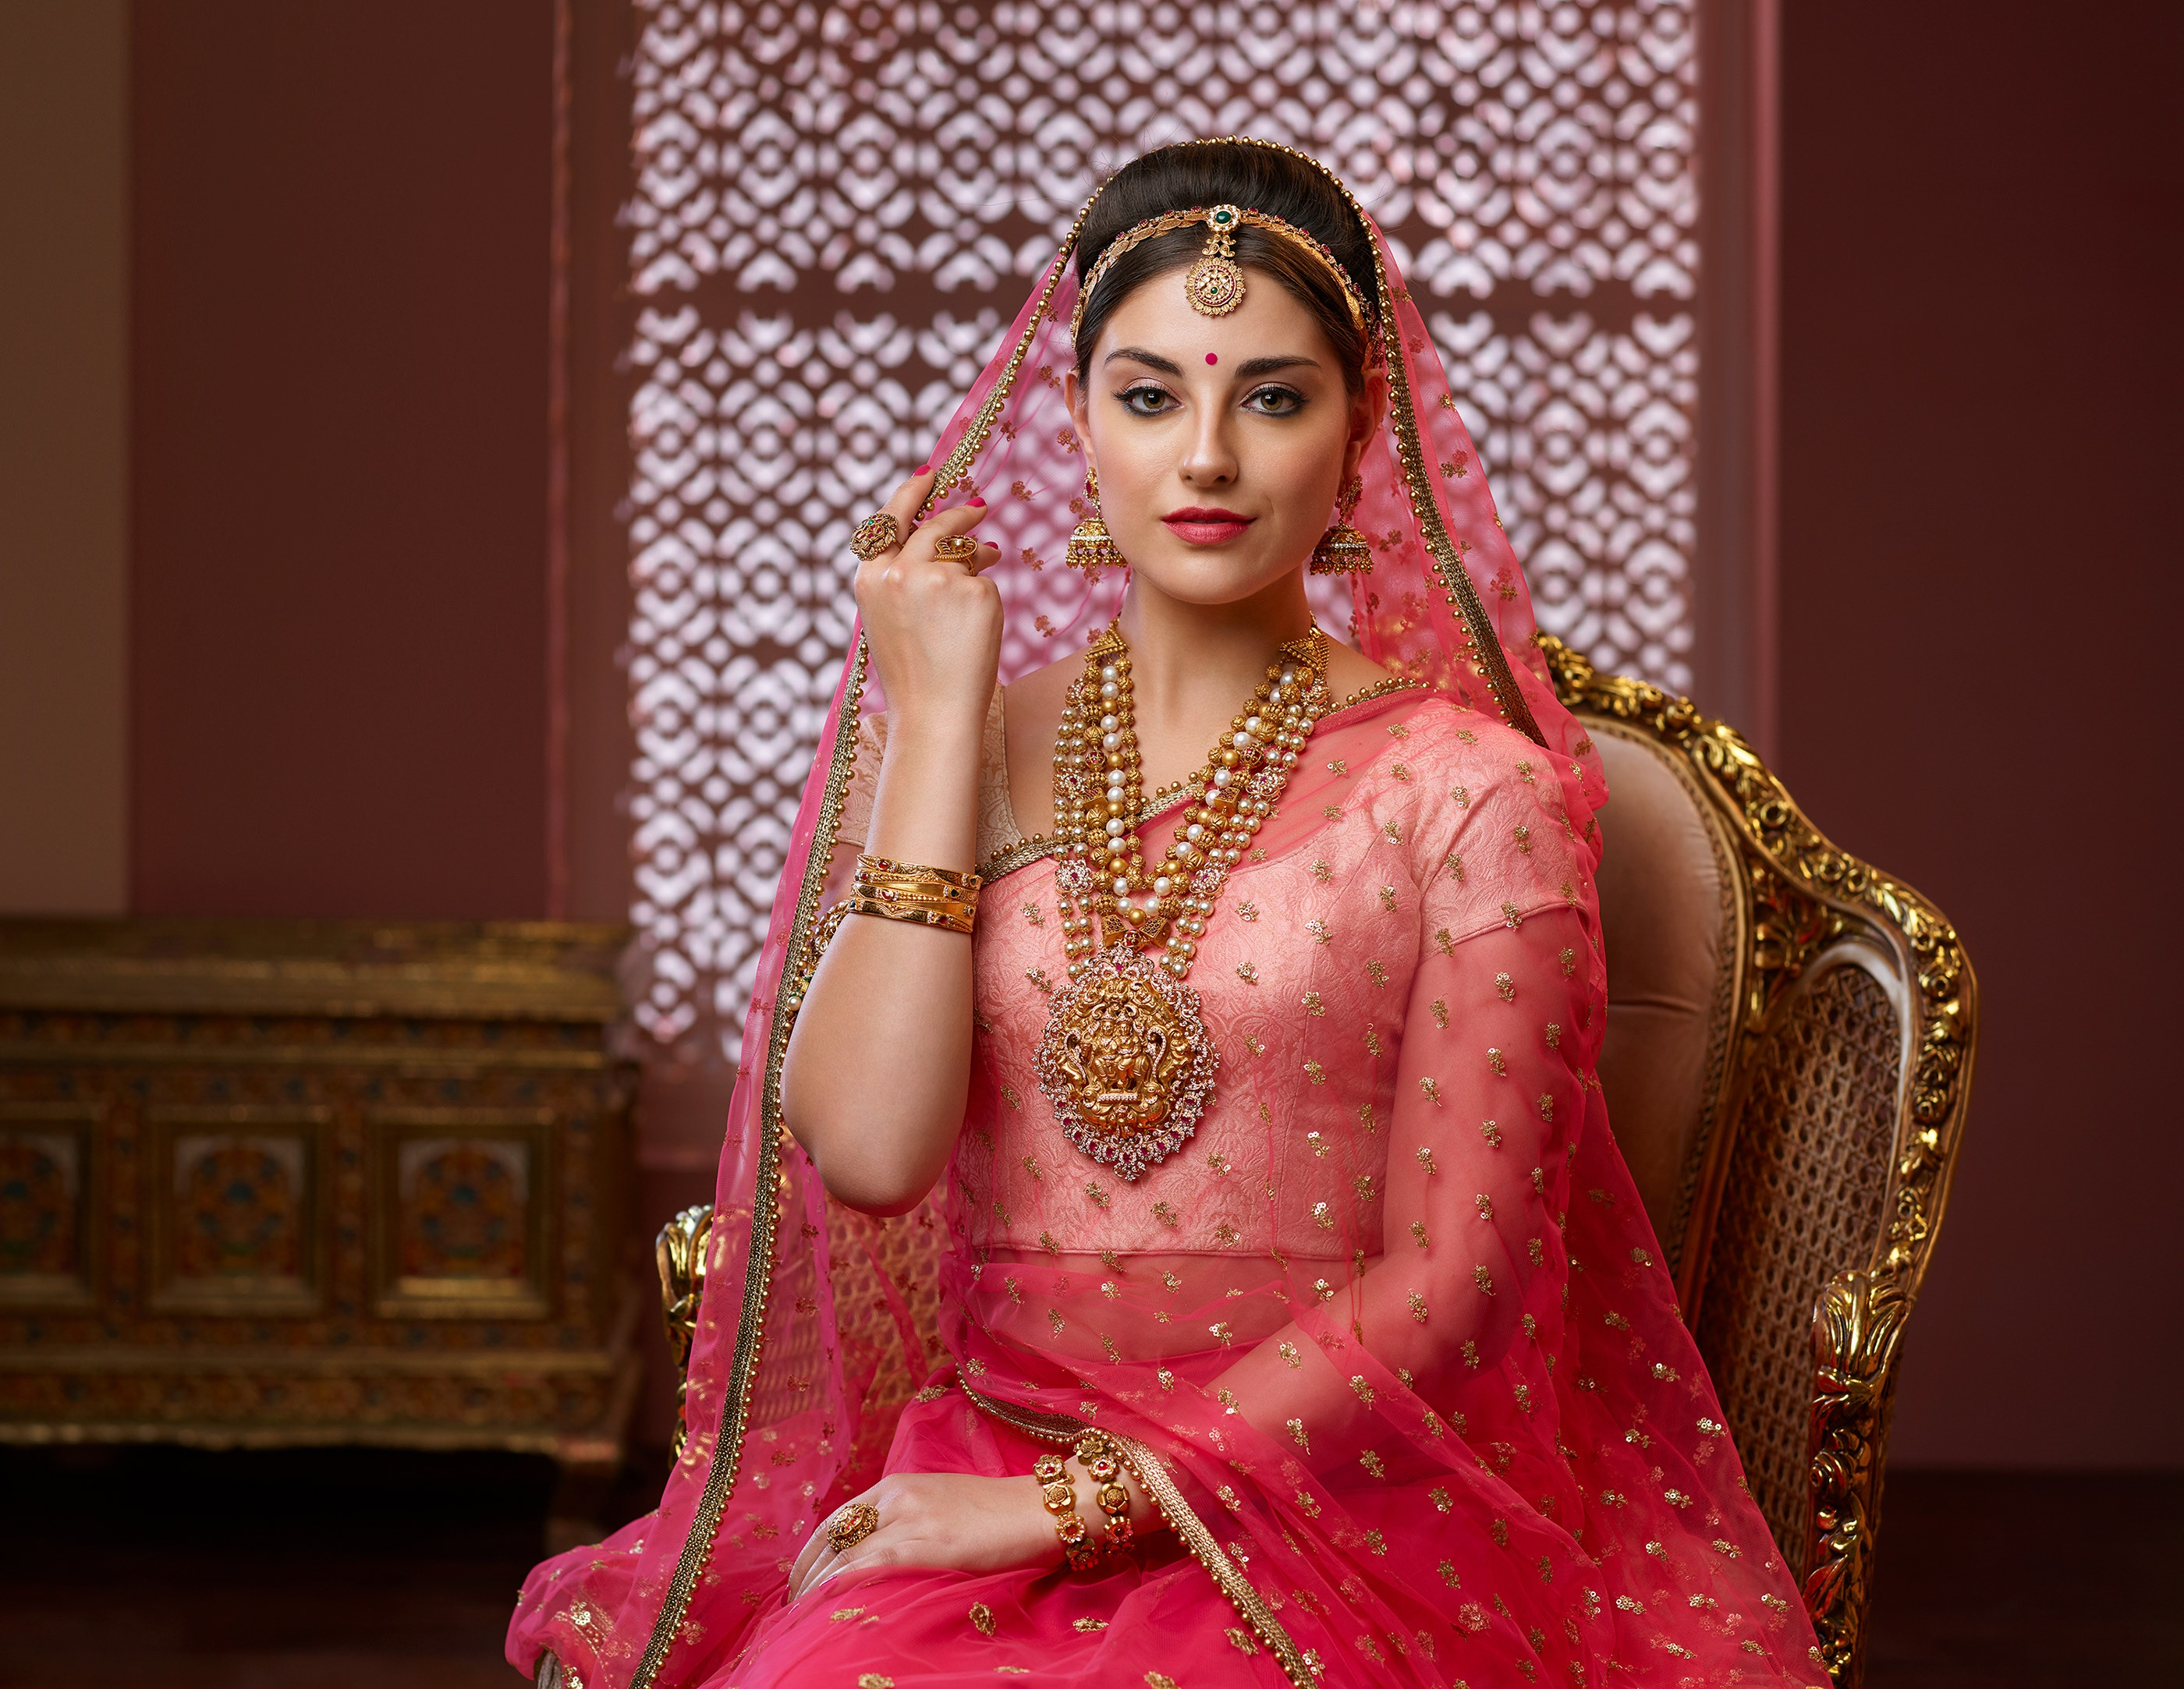 Indian Jewelry Saree Black Hair Necklace Lipstick Woman 2800x2166